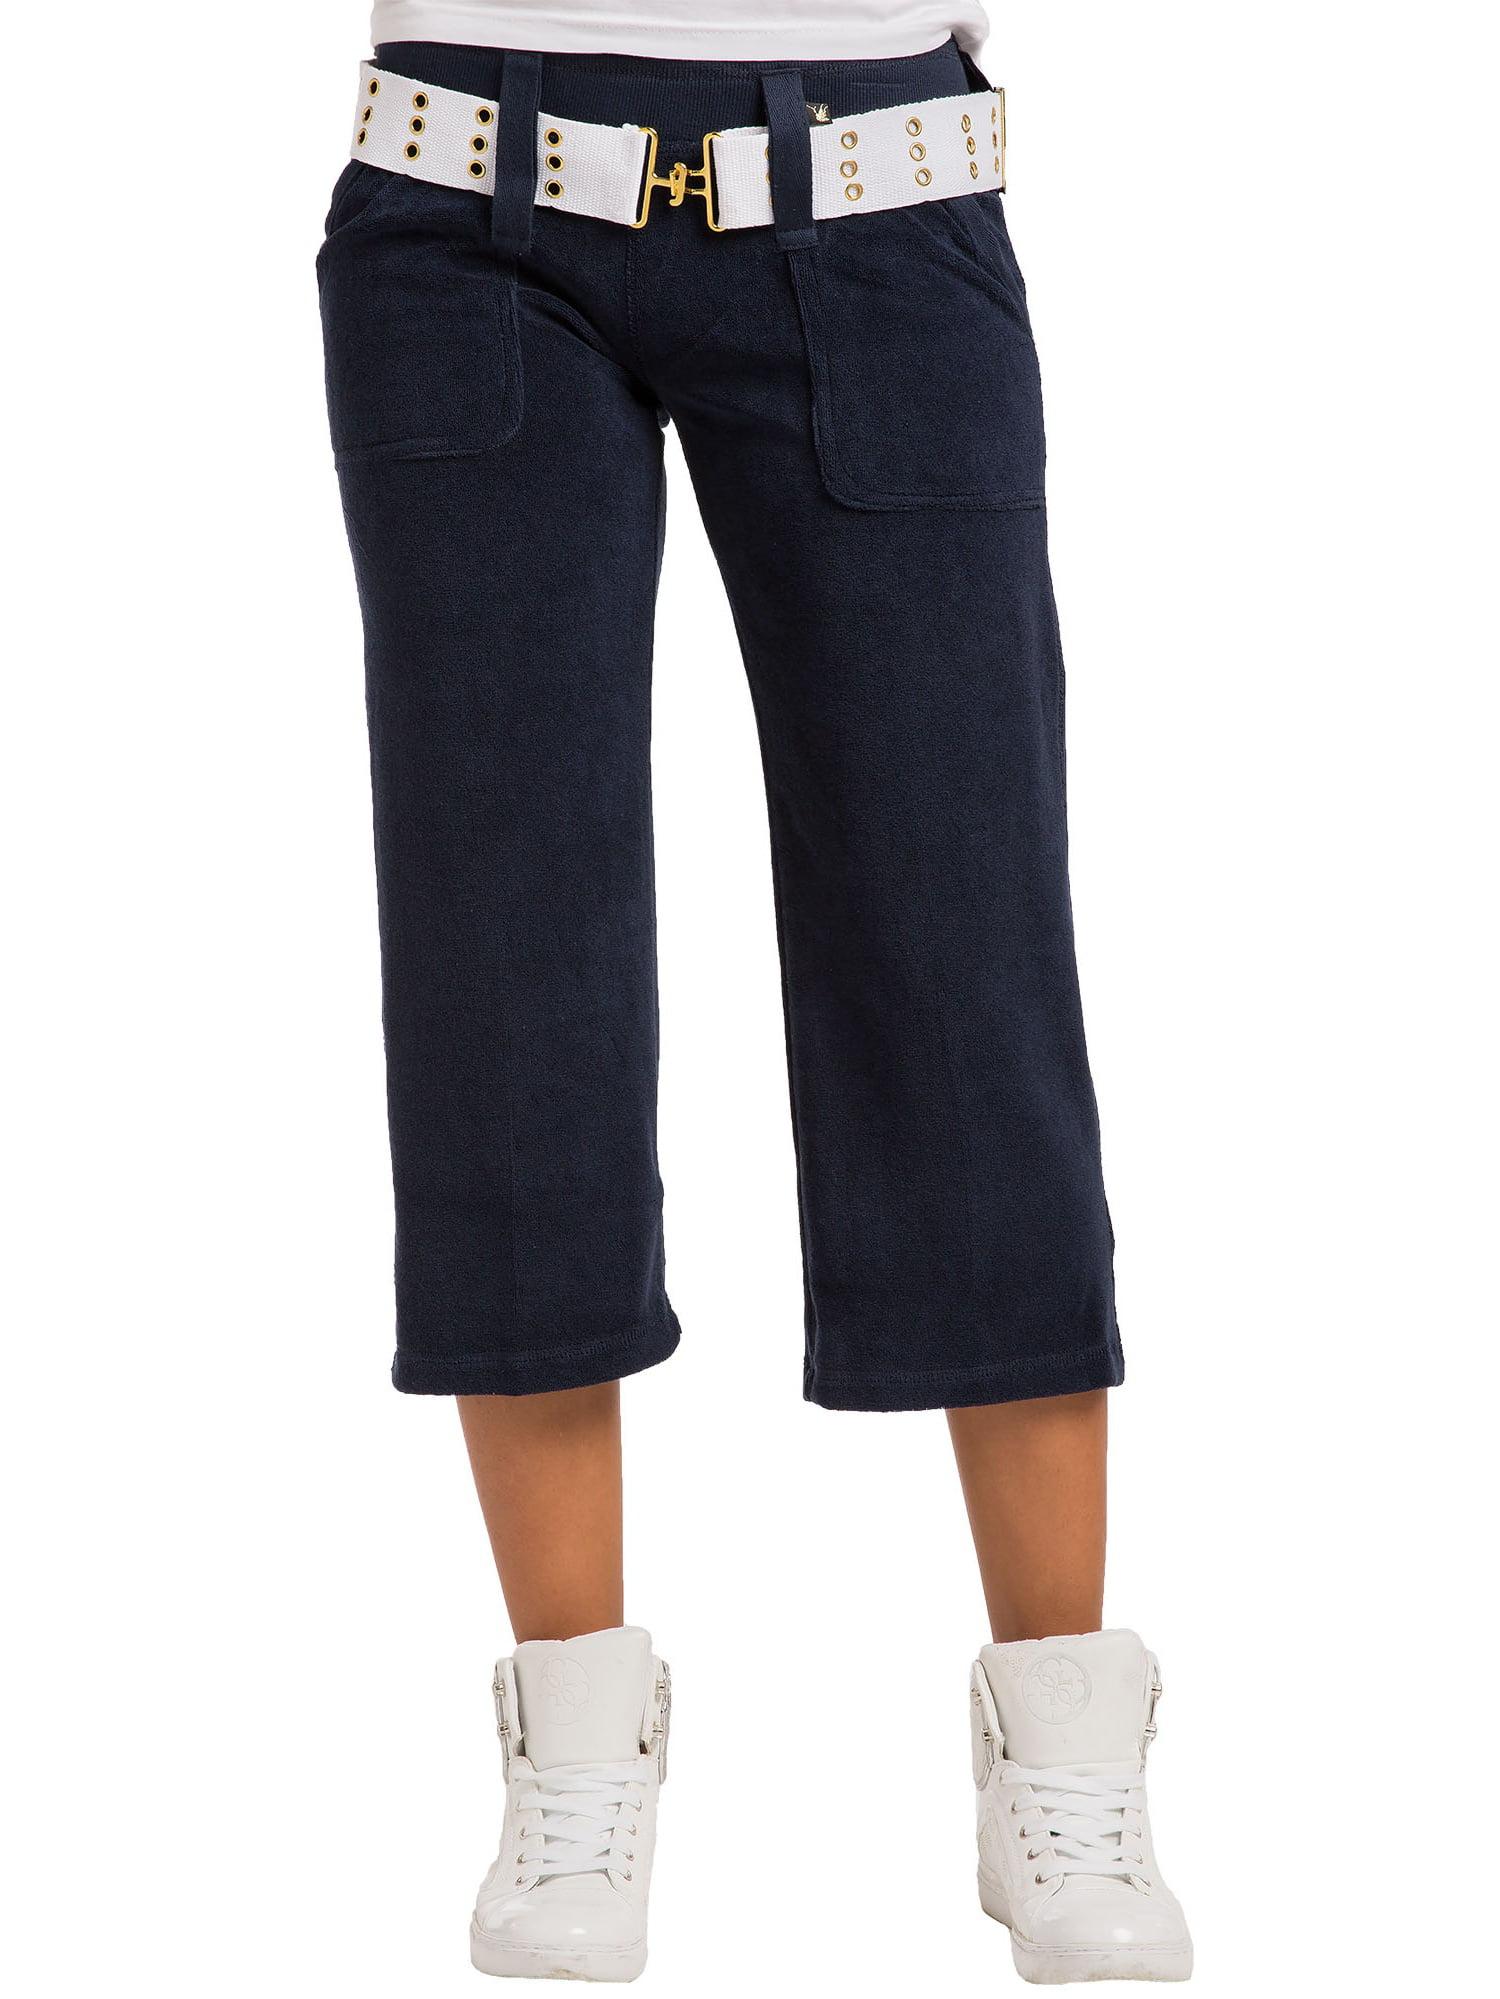 Sweet Vibes Junior Women Olive Terry Gaucho Pants With Grommet Belt